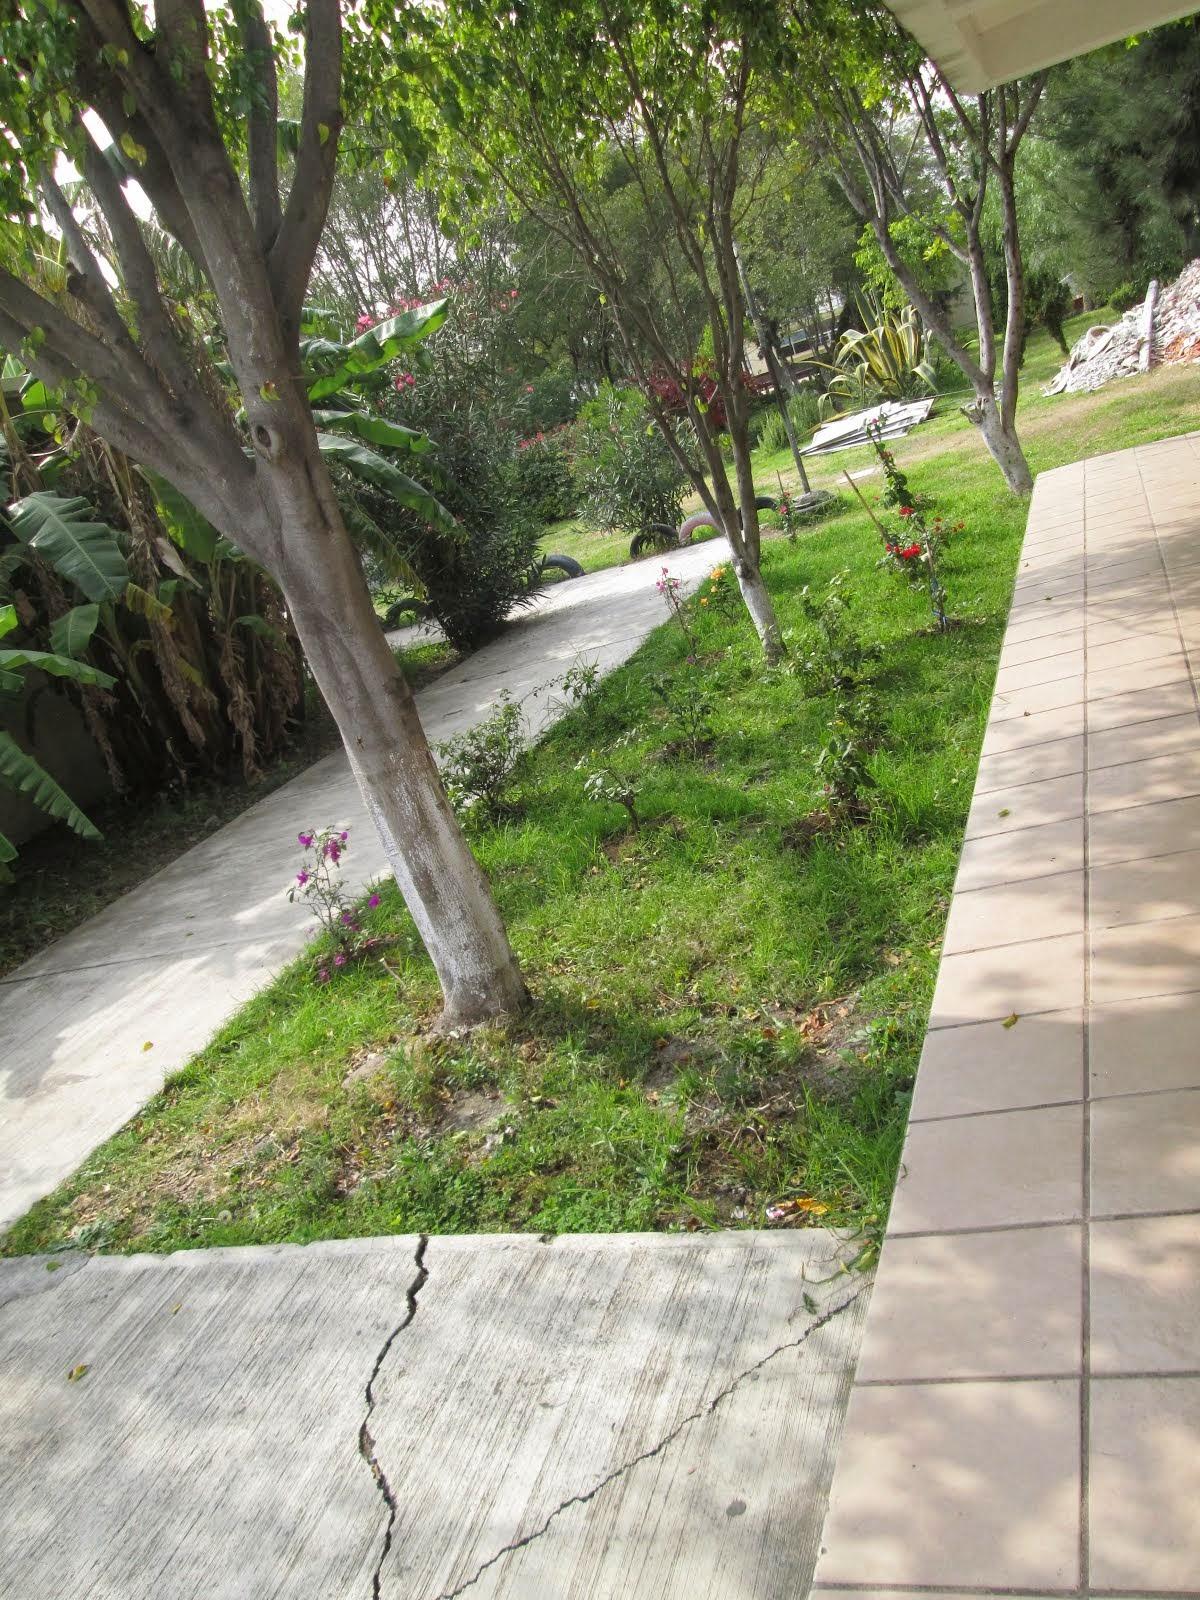 Paseo de las bugambilias